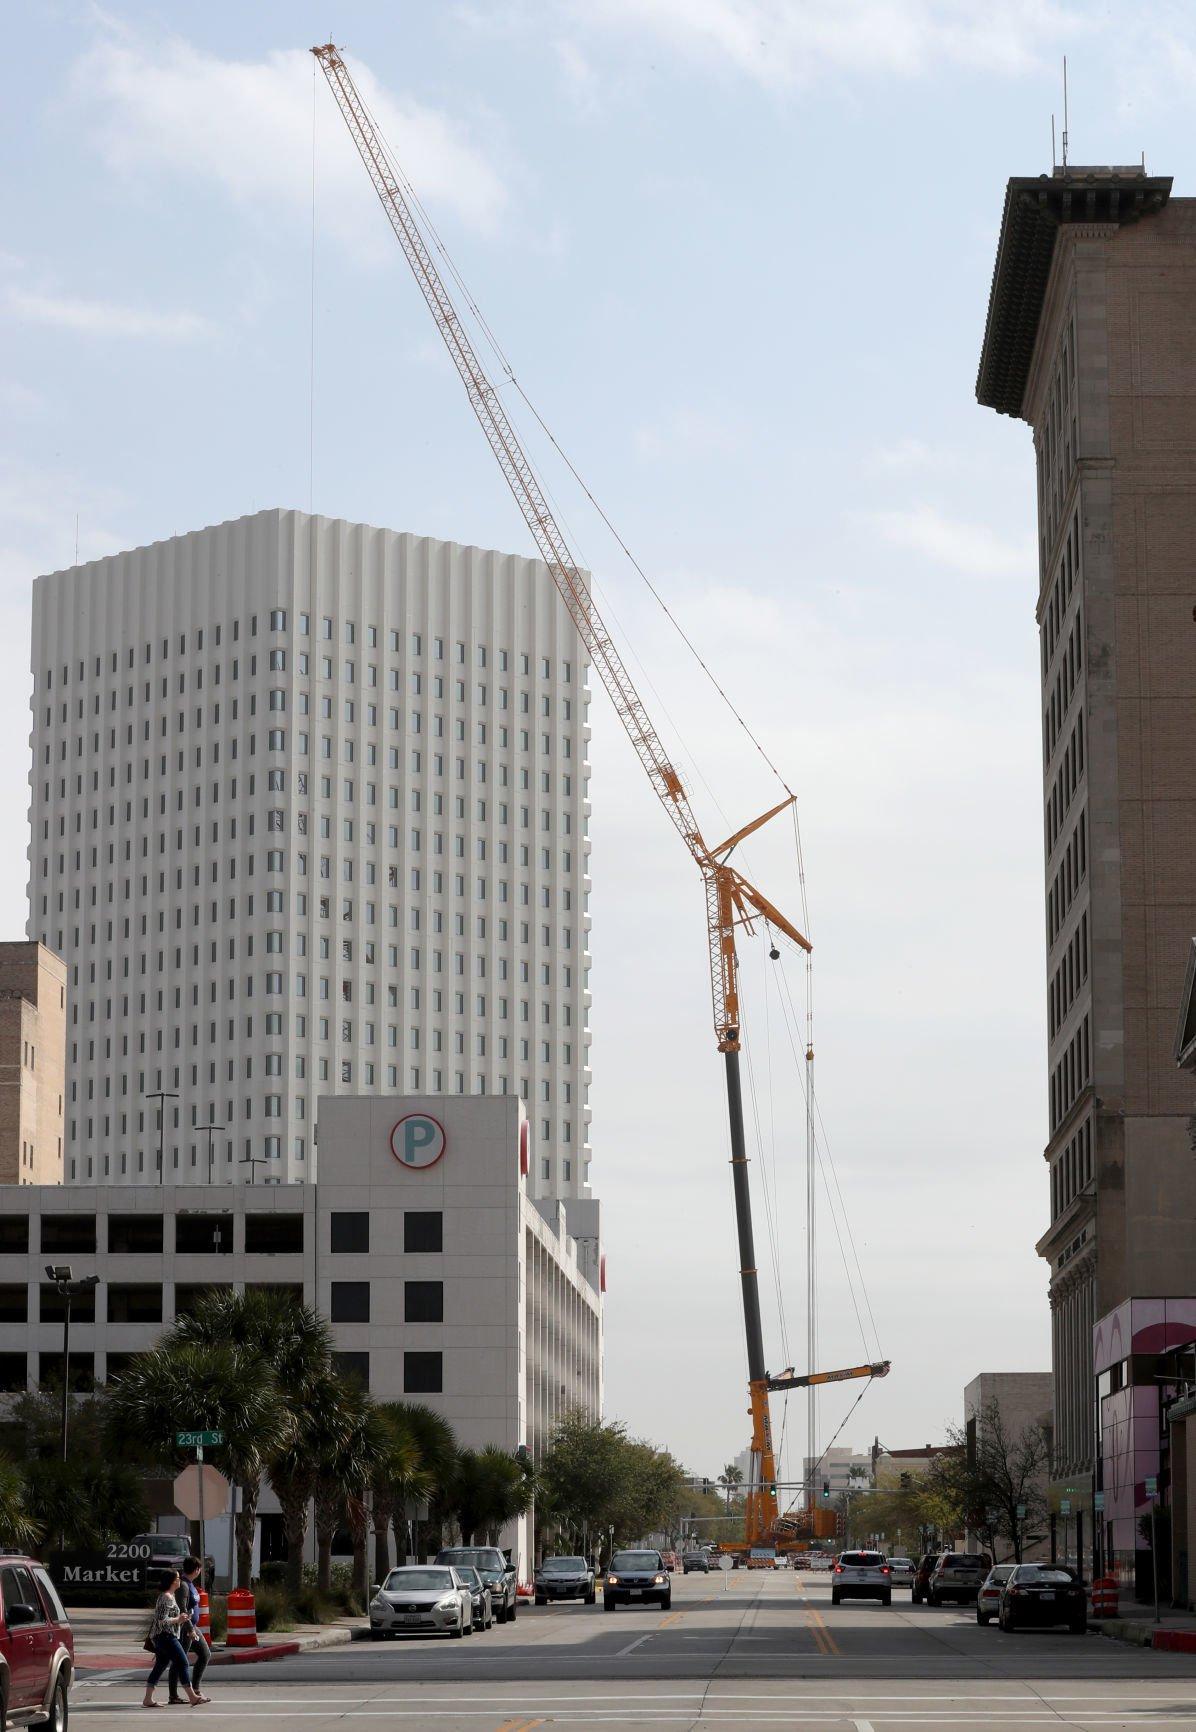 Enormous crane at ANICO